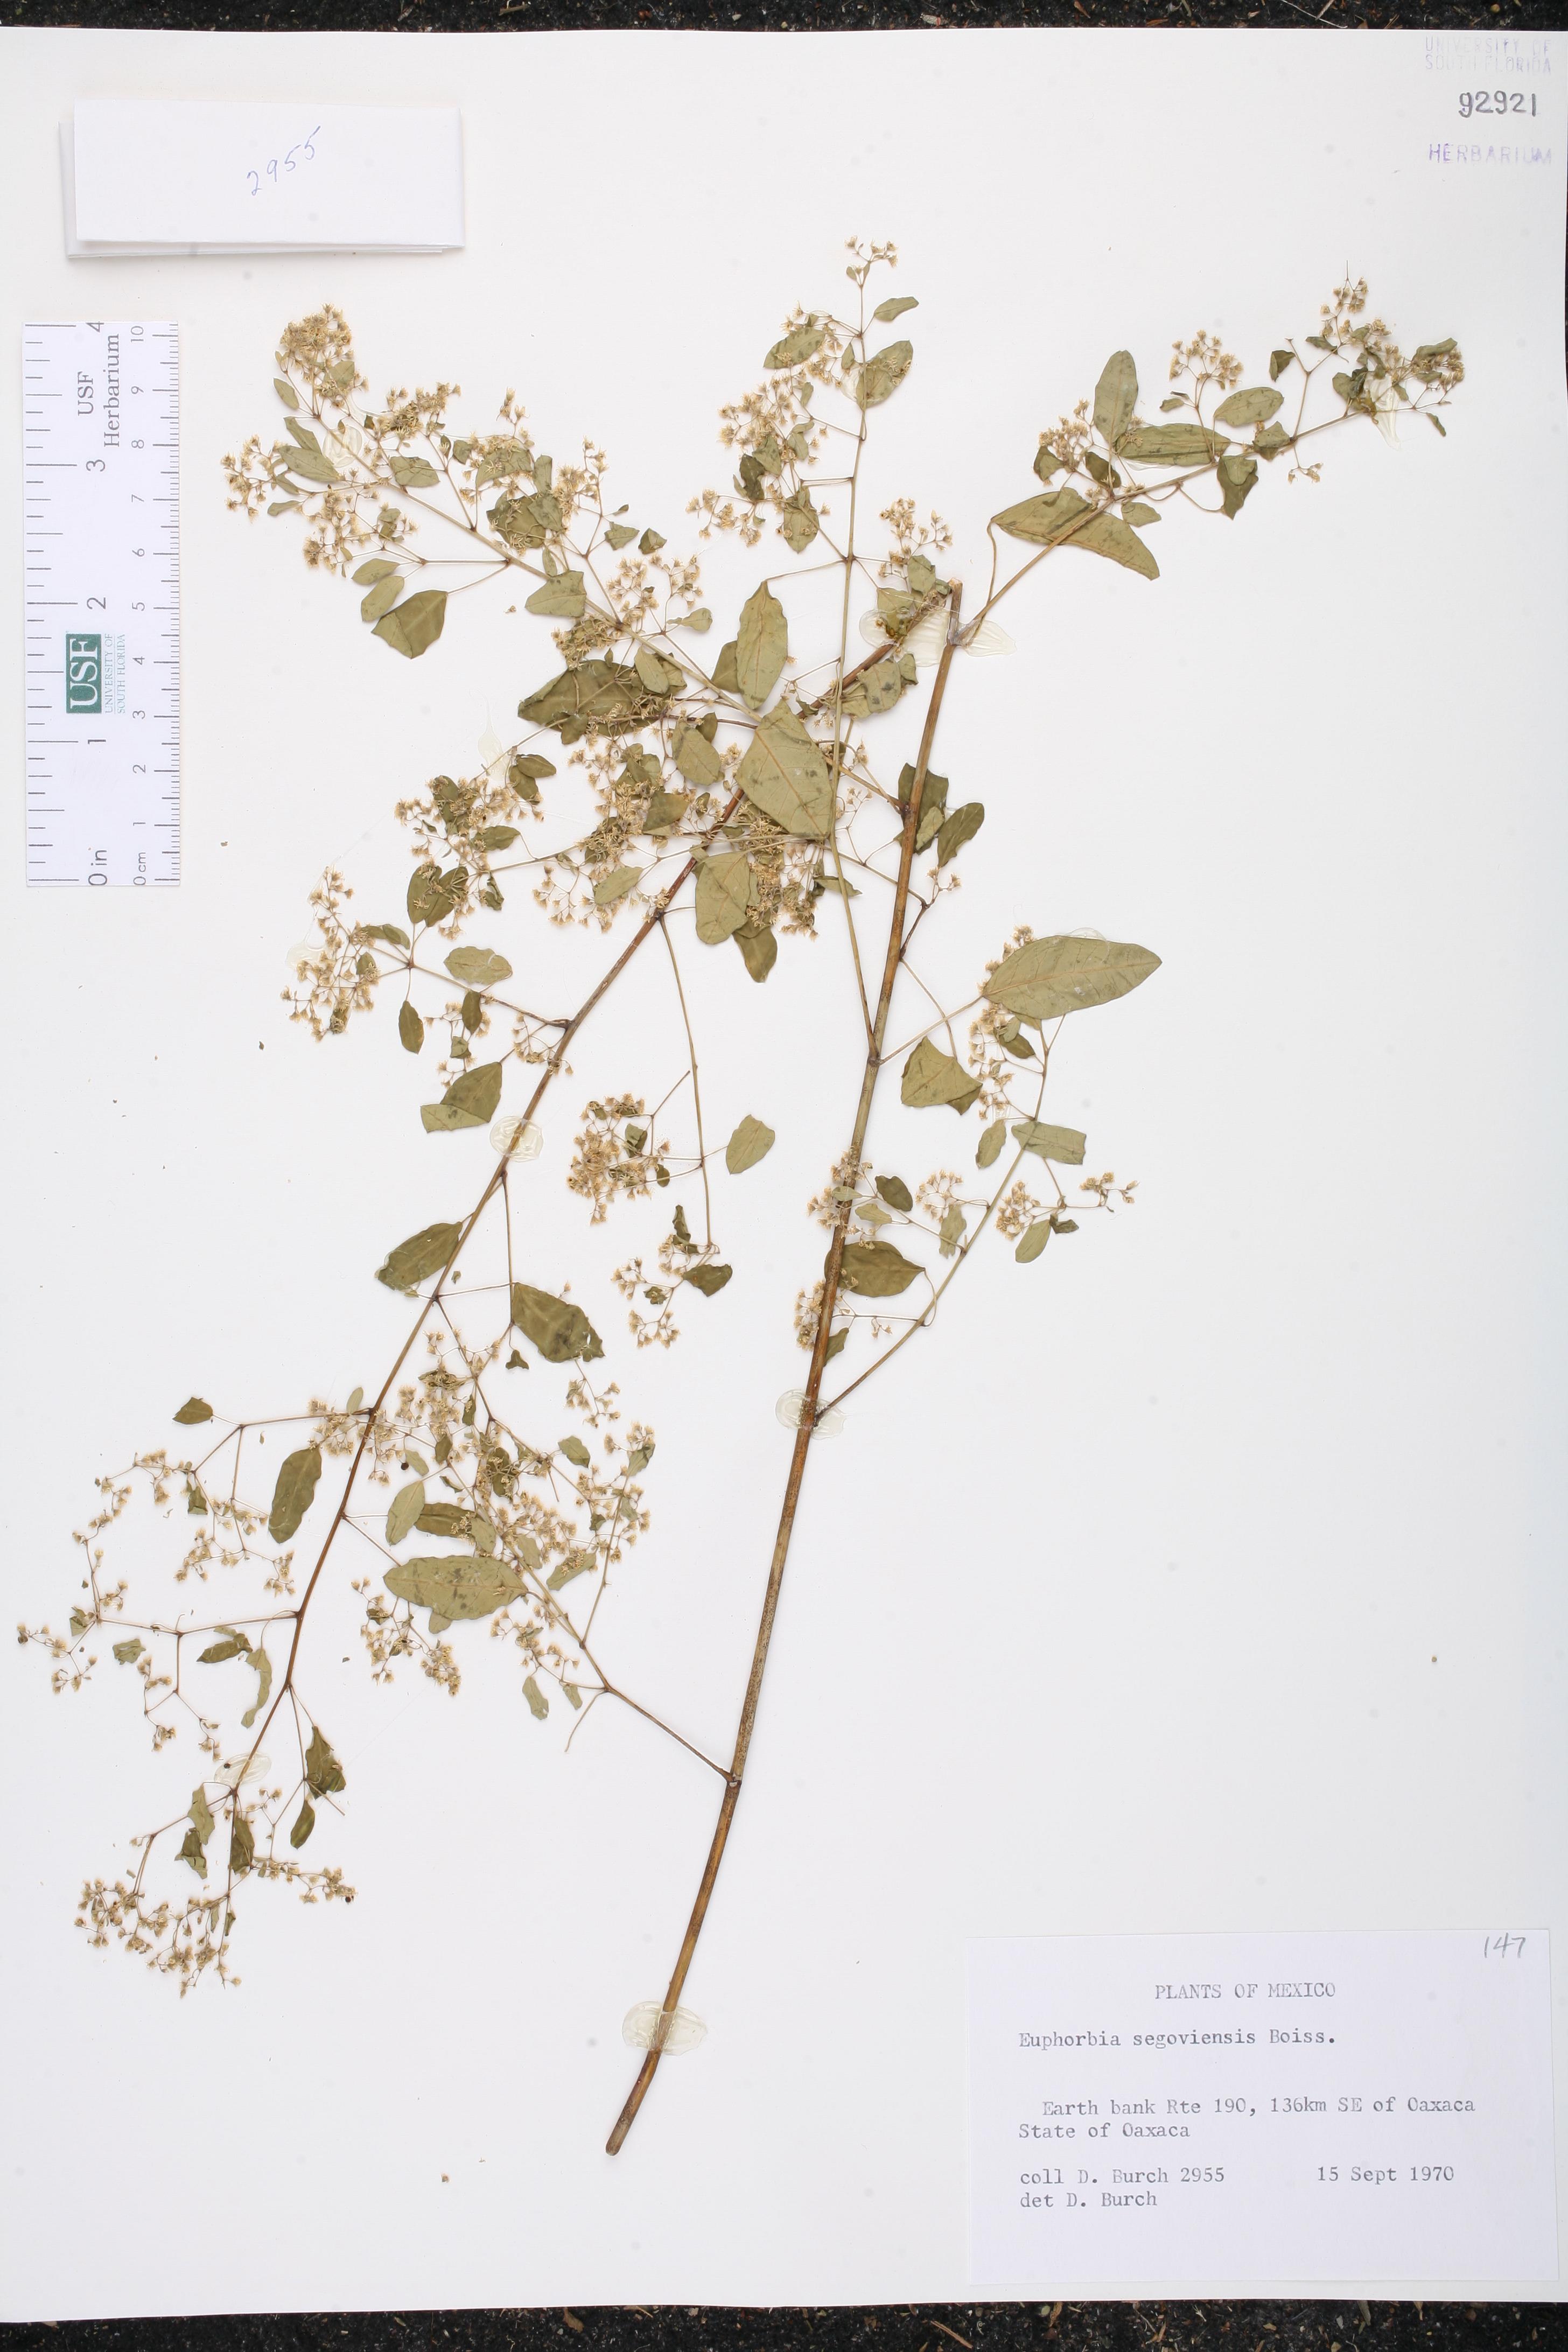 Euphorbia segoviensis image